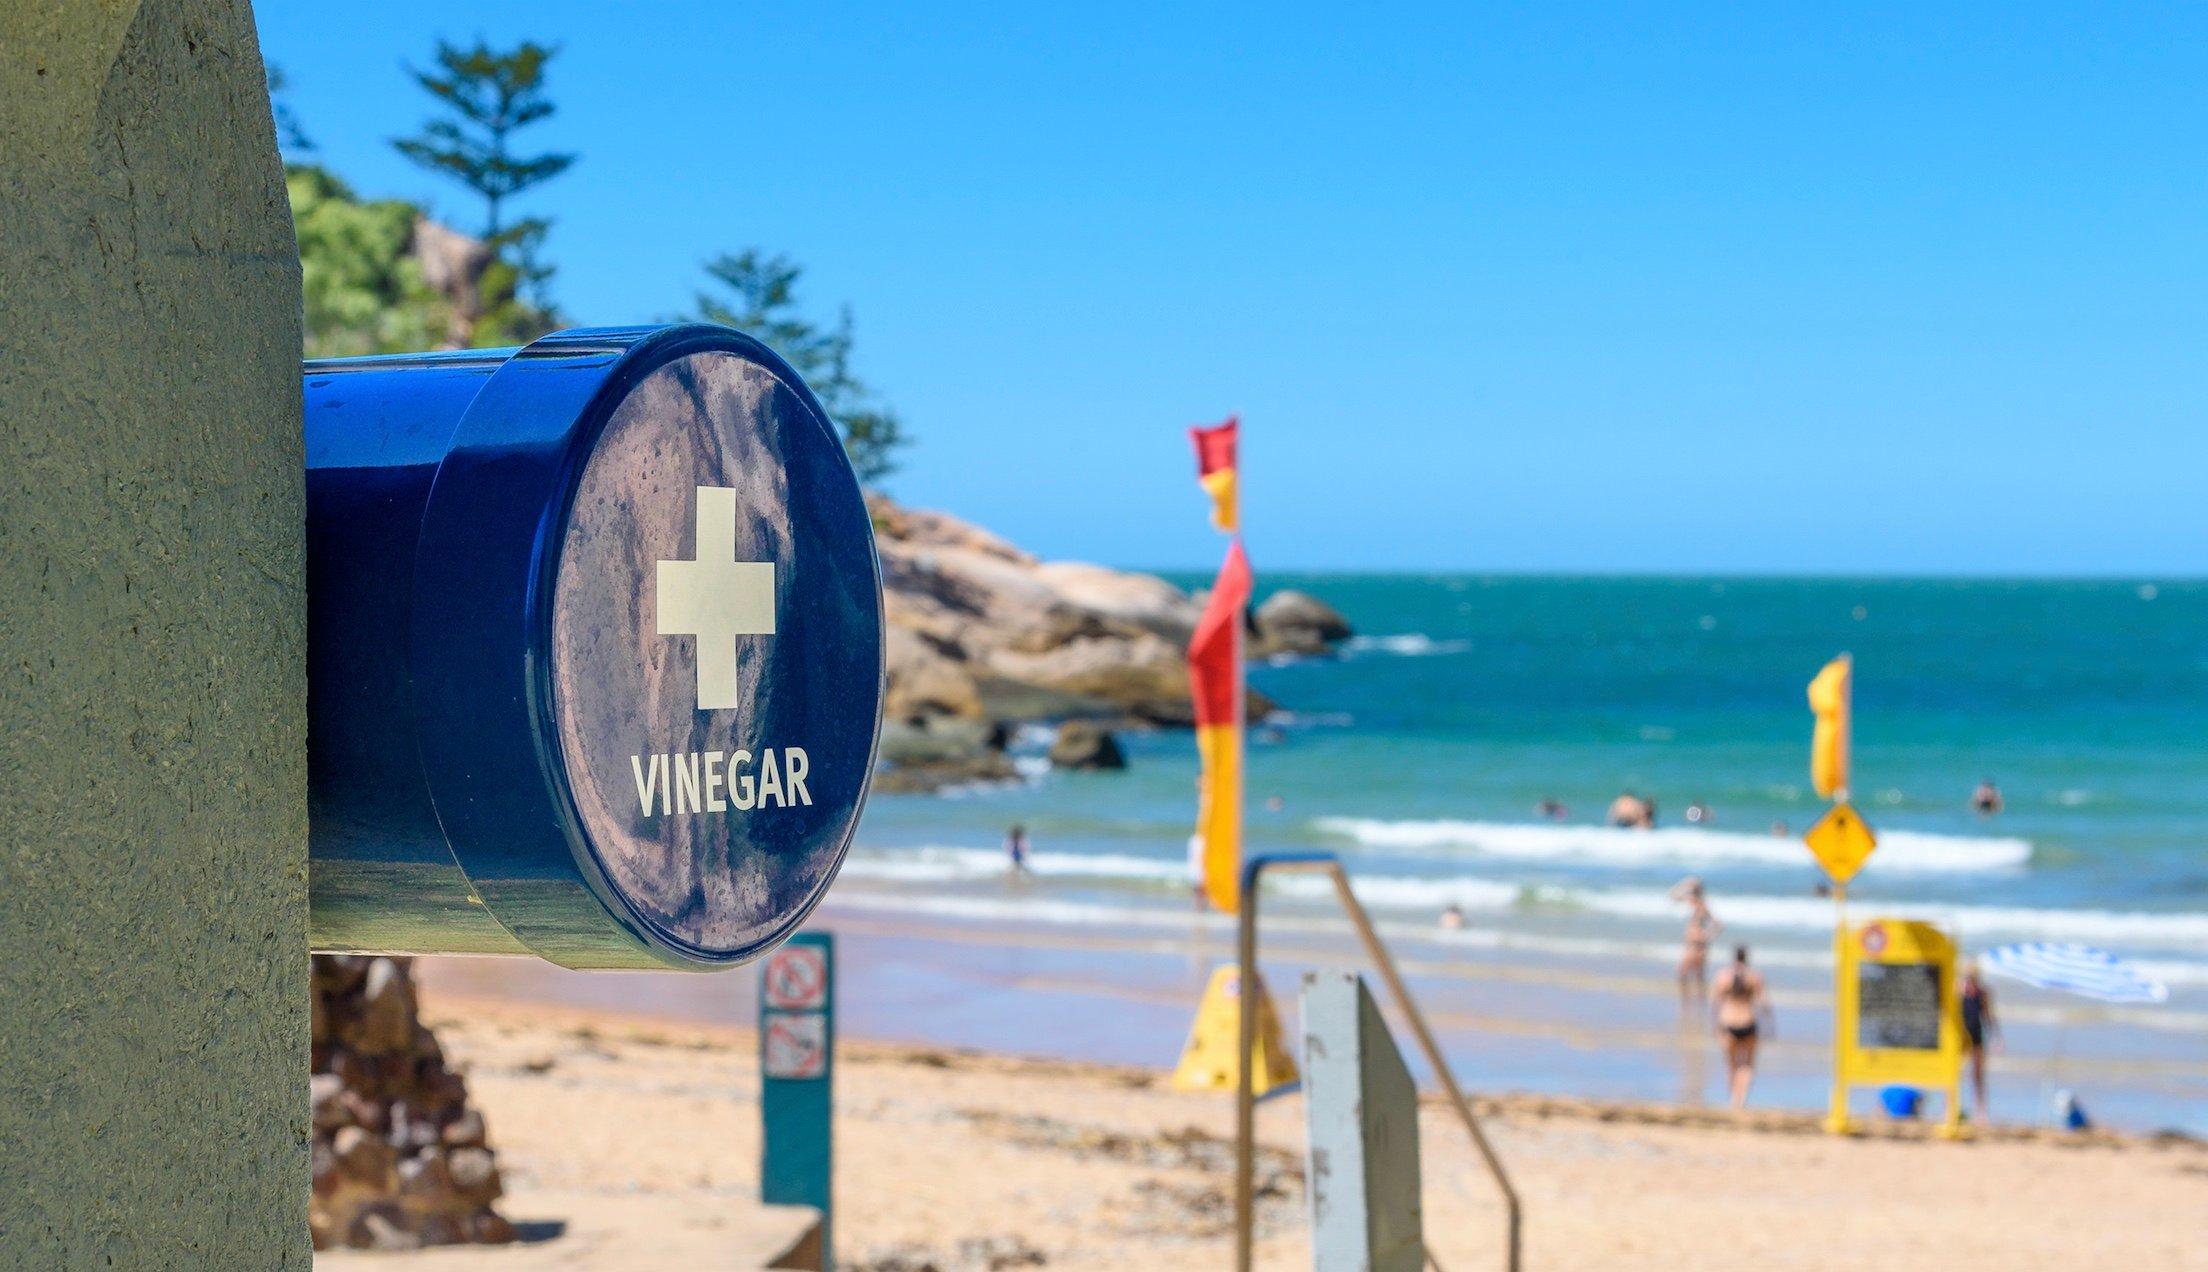 vinegar station on beach